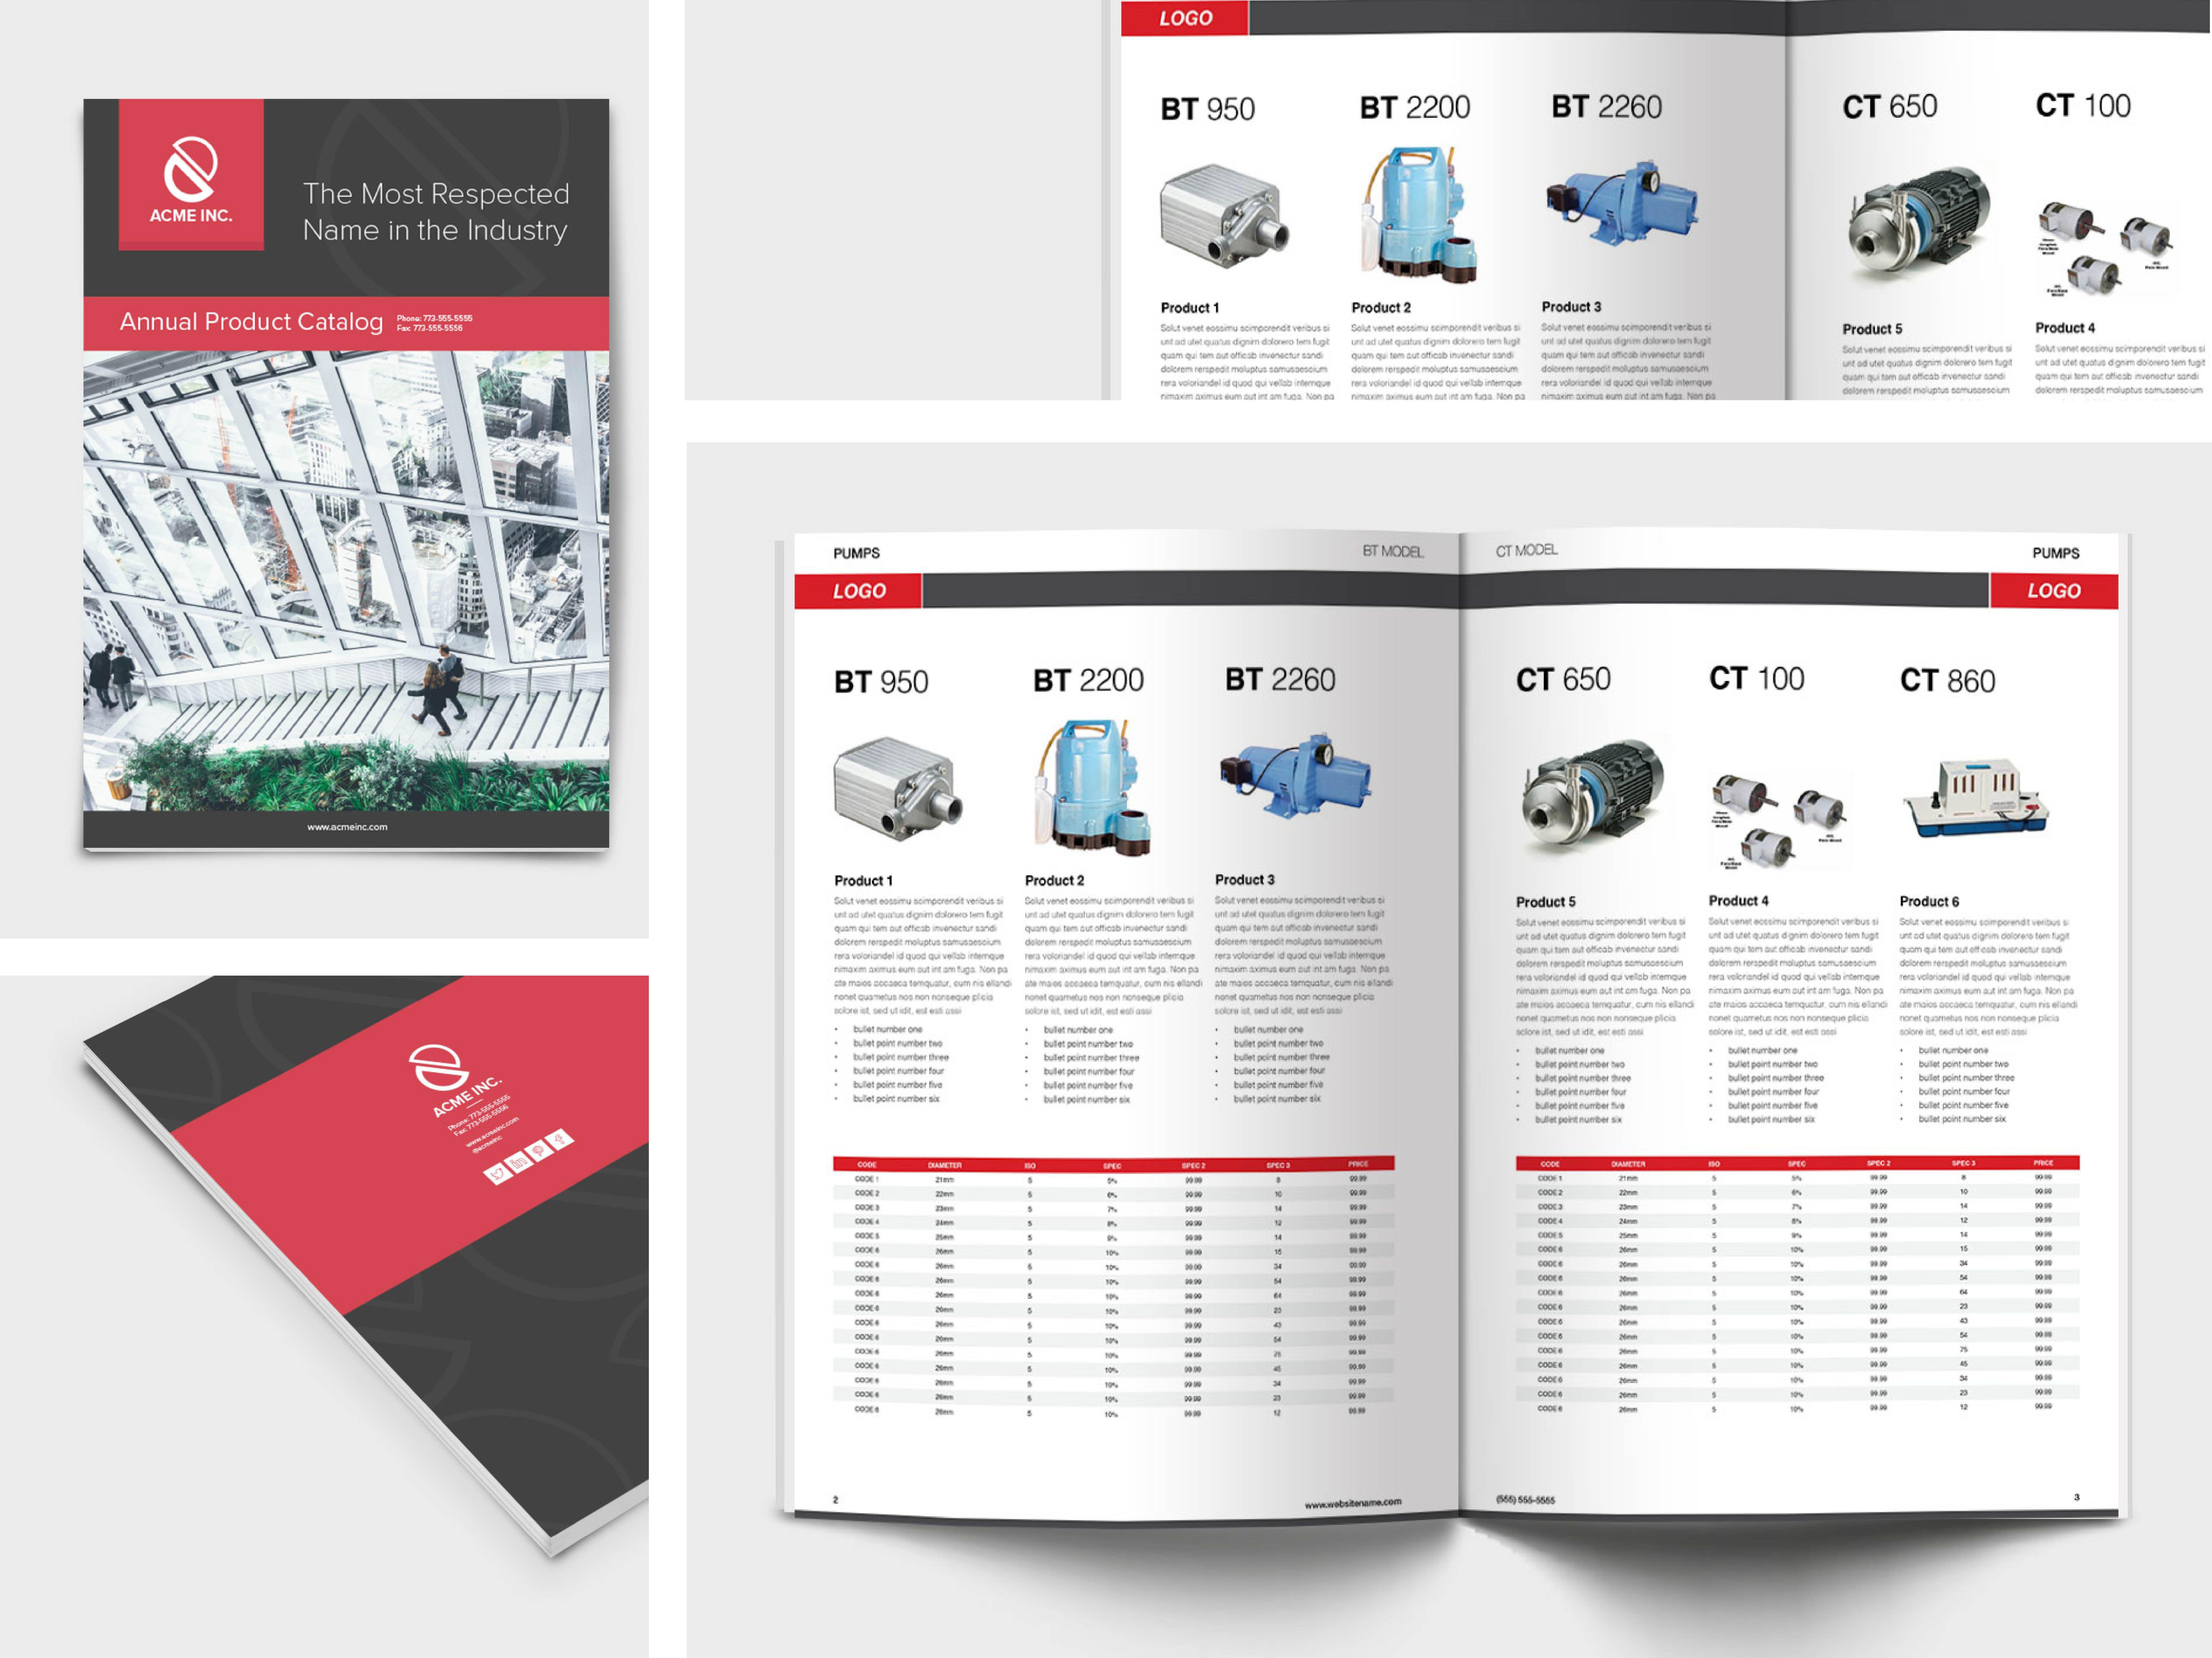 Free Industrial B2b Catalog Template Download At Www Catsy Com Catsy Kit 1 Zip 마케팅 전략 자동차 정비 마케팅